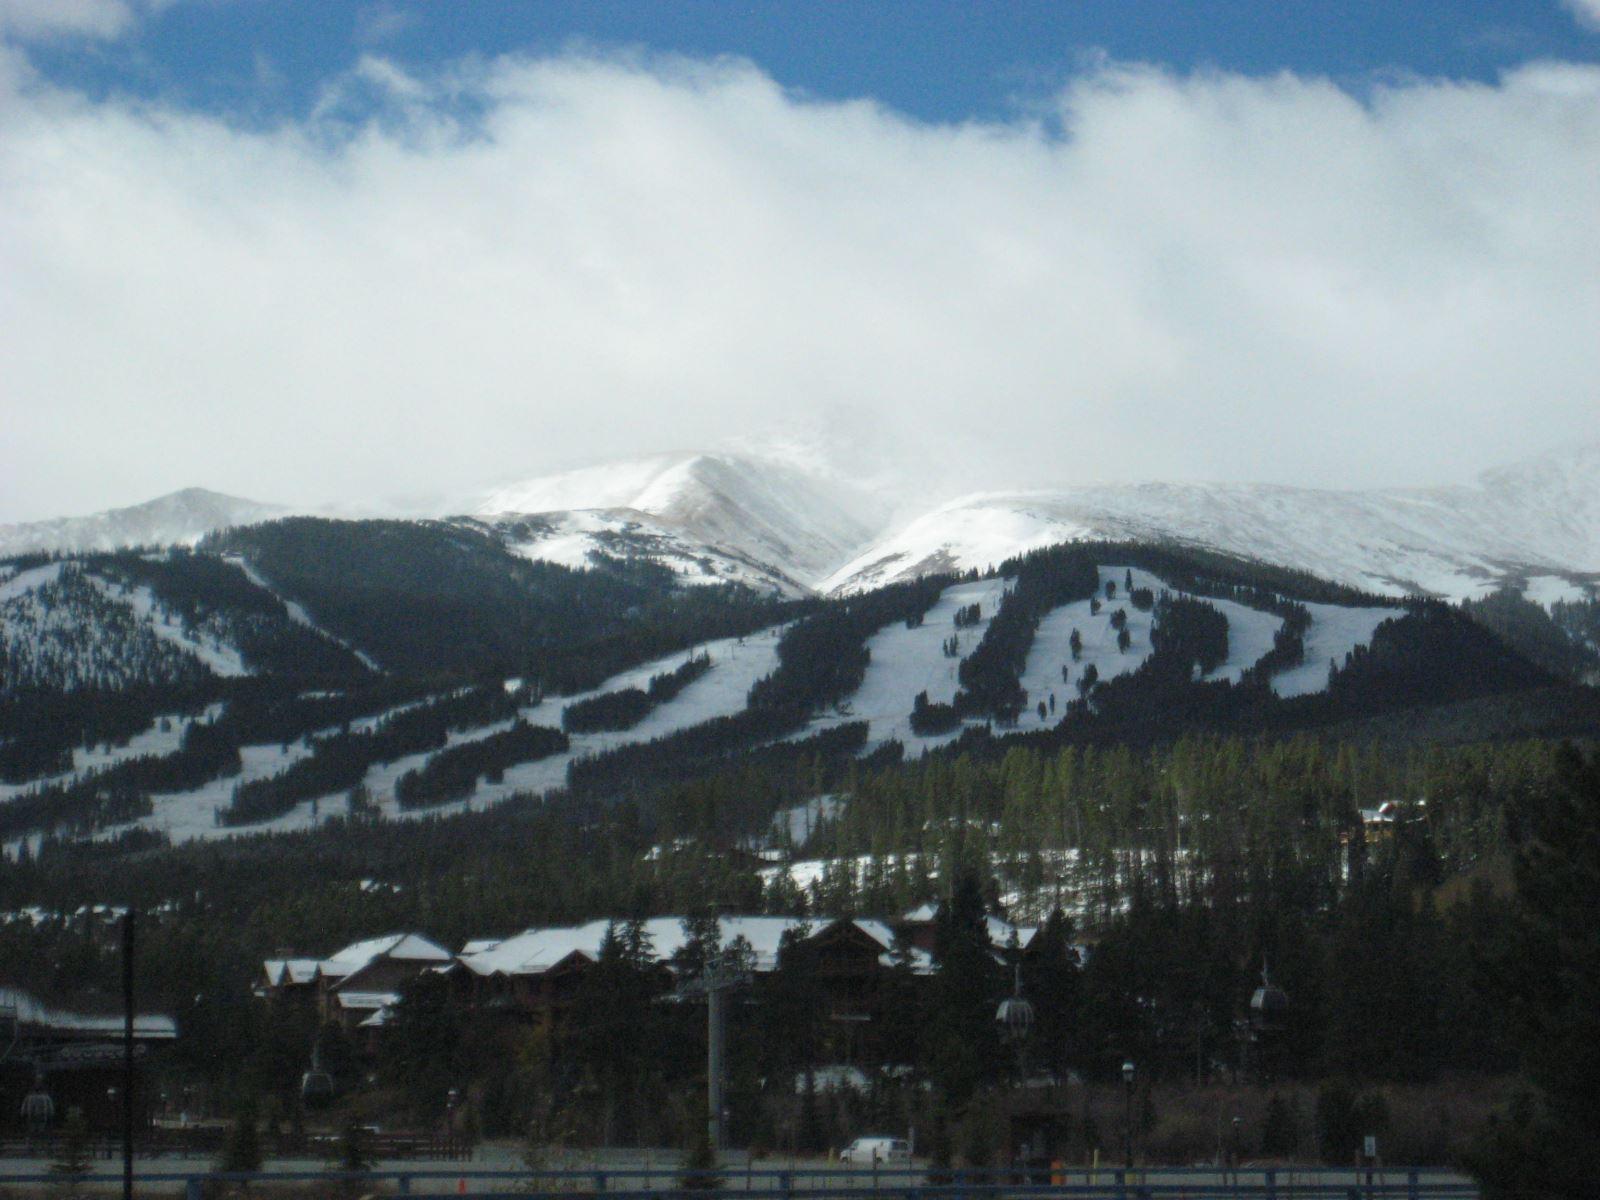 The slopes of Breckenridge